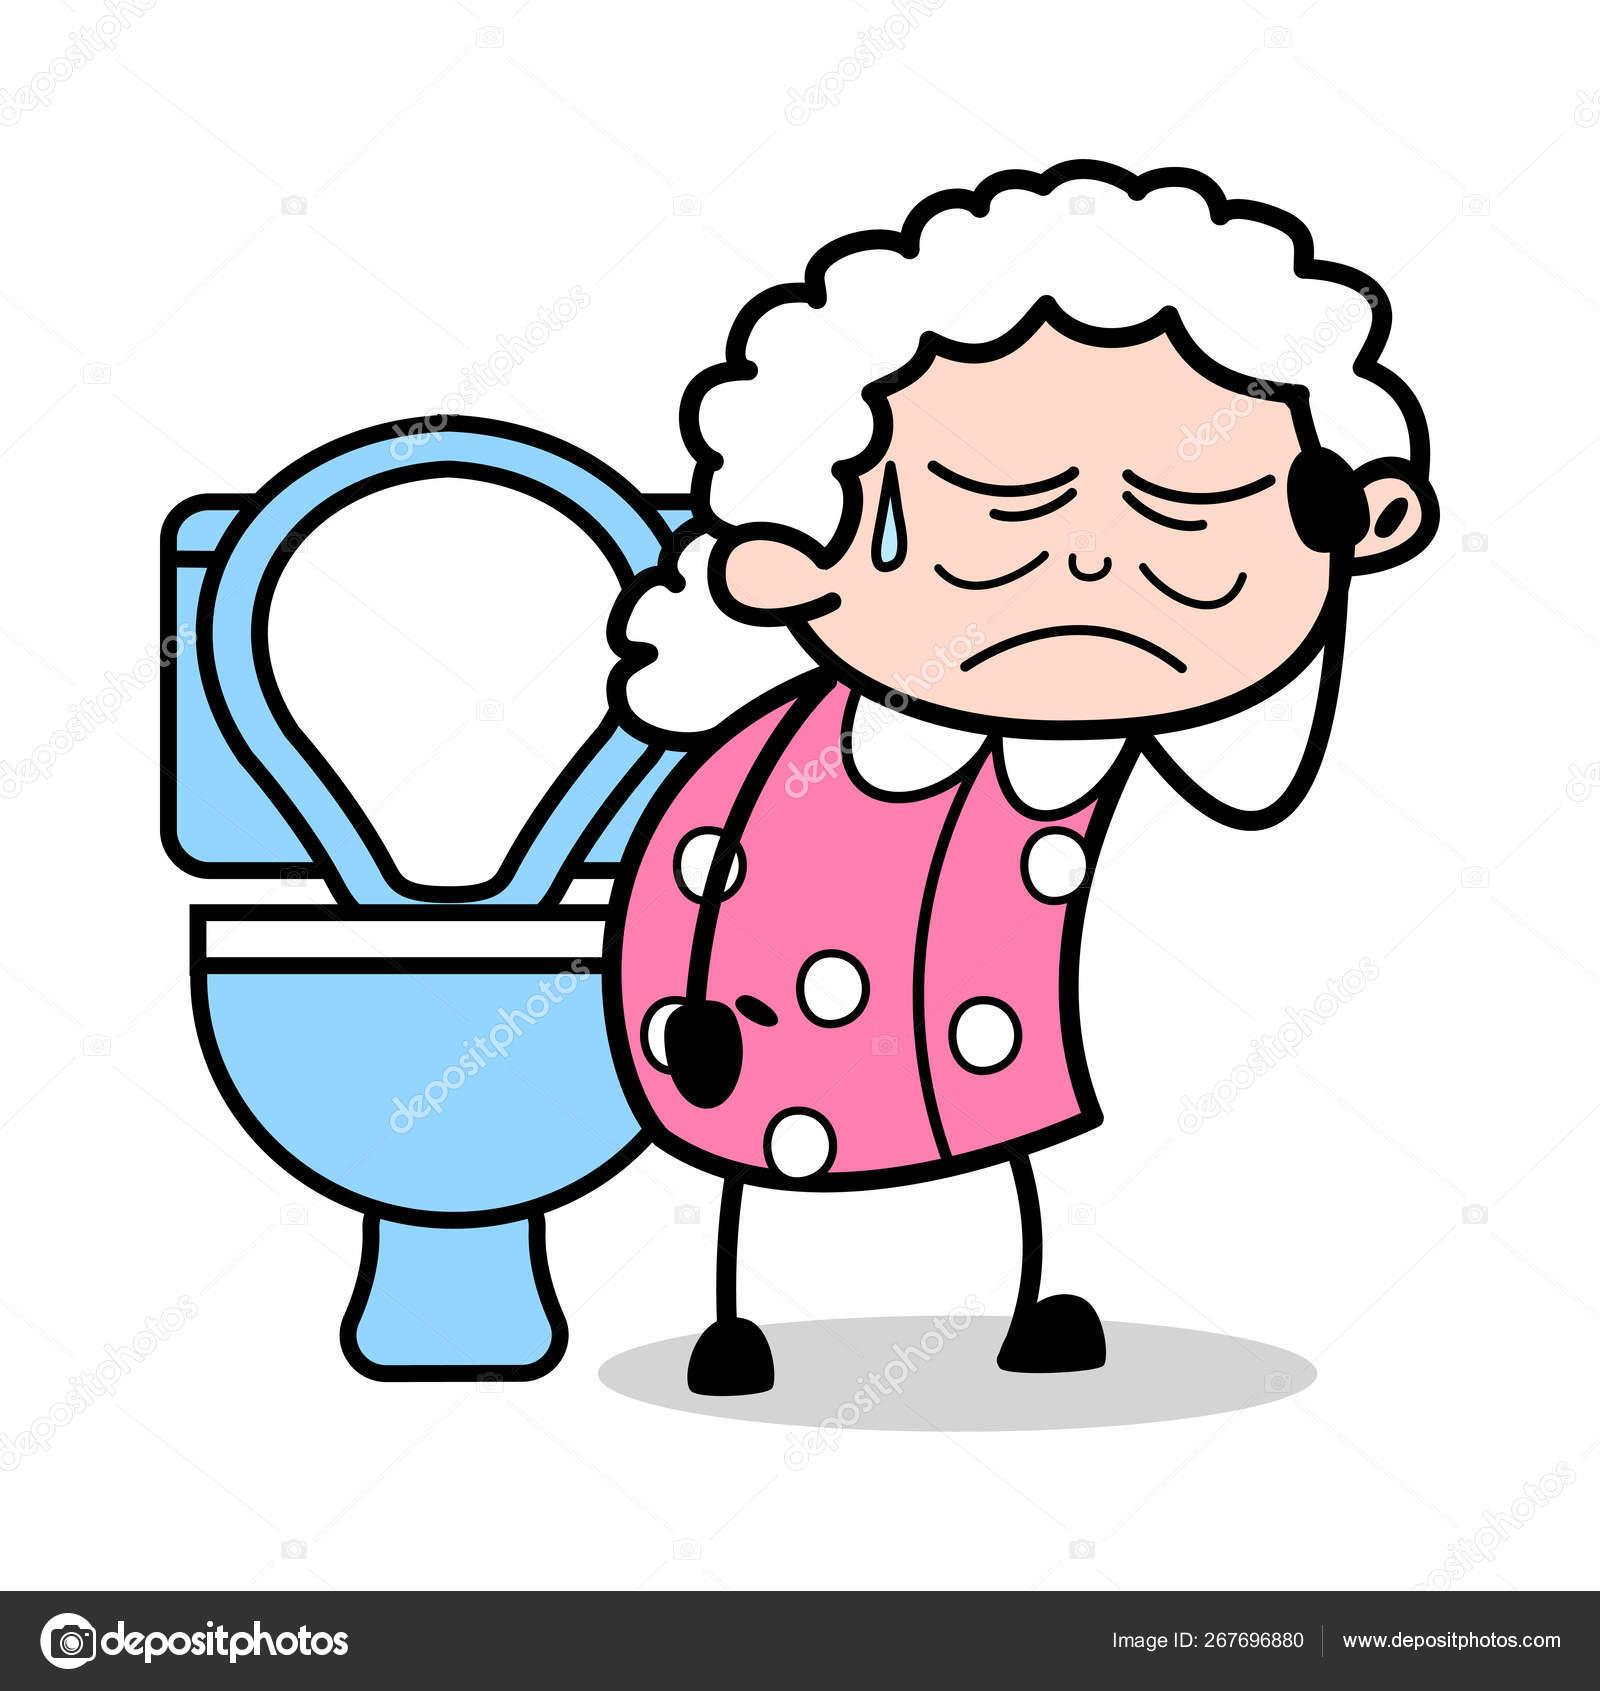 Constipation Old Woman Cartoon Granny Vector Illustration Stock Vector C Lineartist 267696880